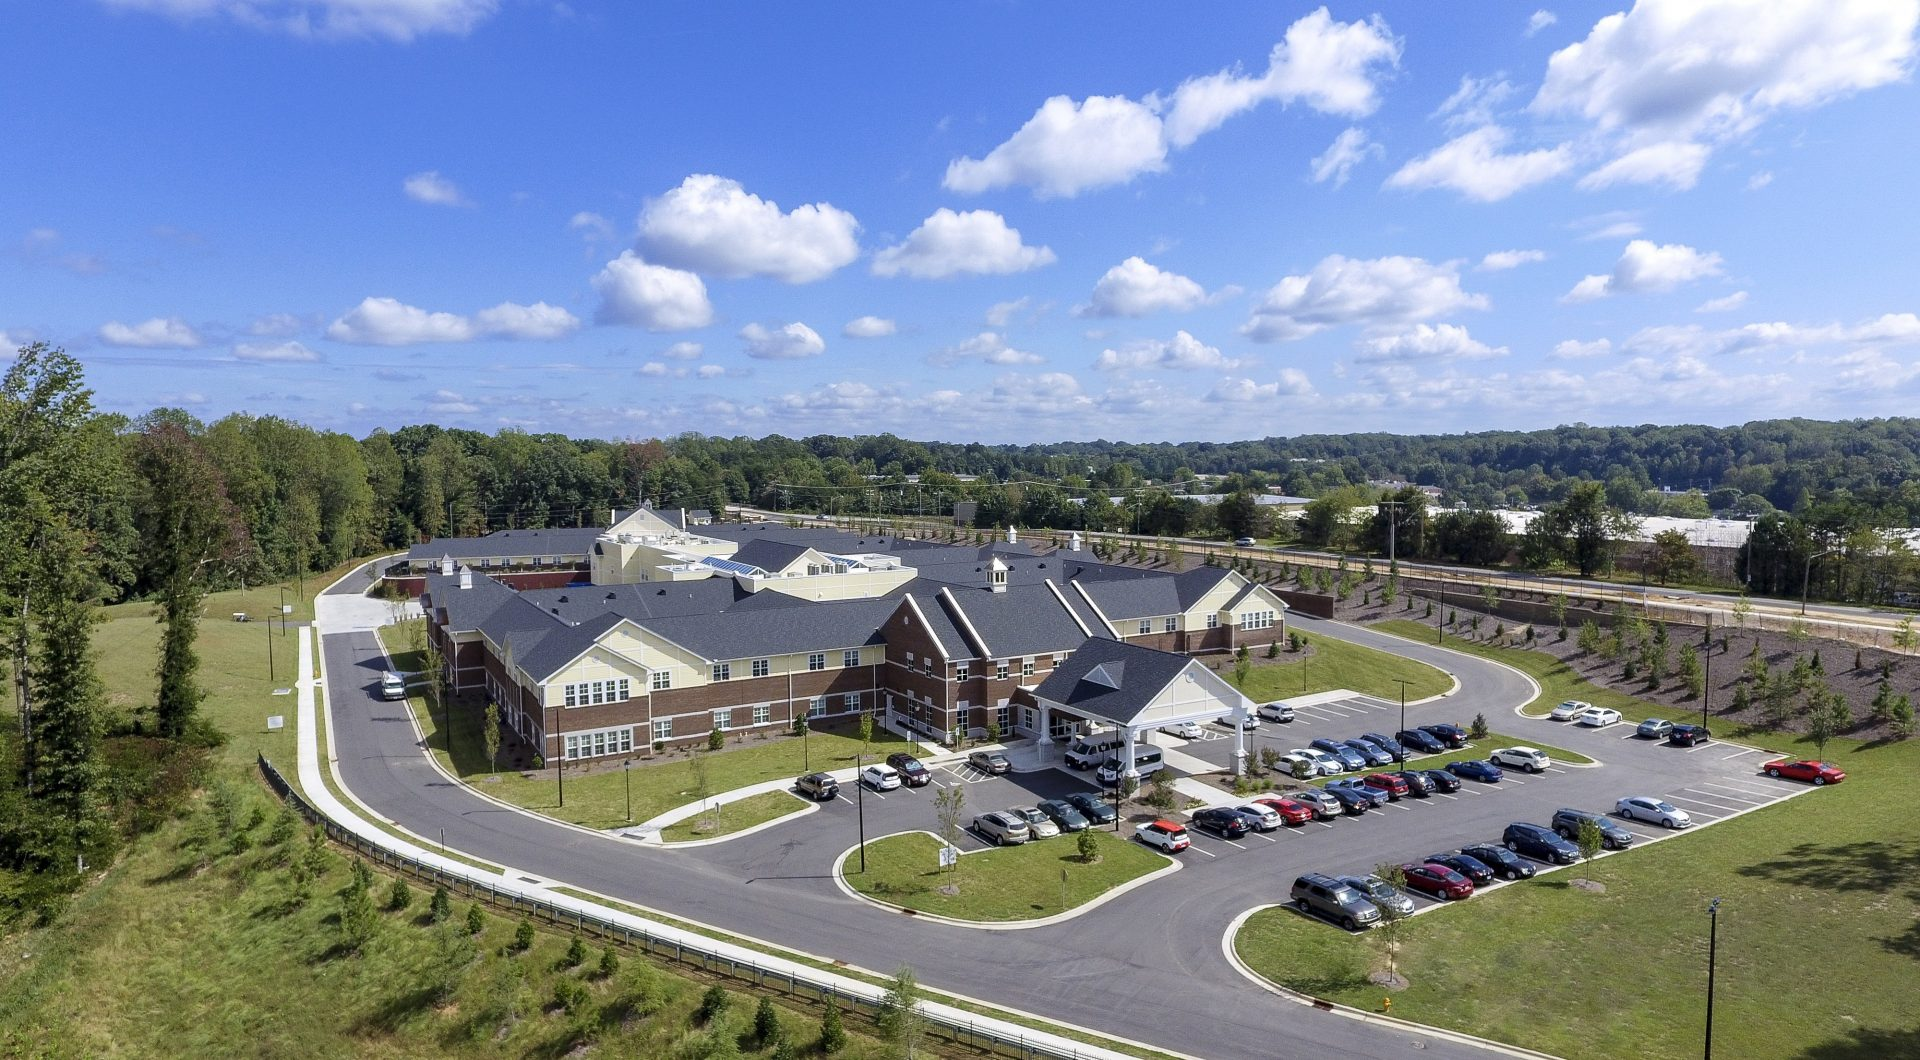 Salemtowne Health Care Center Aerial View